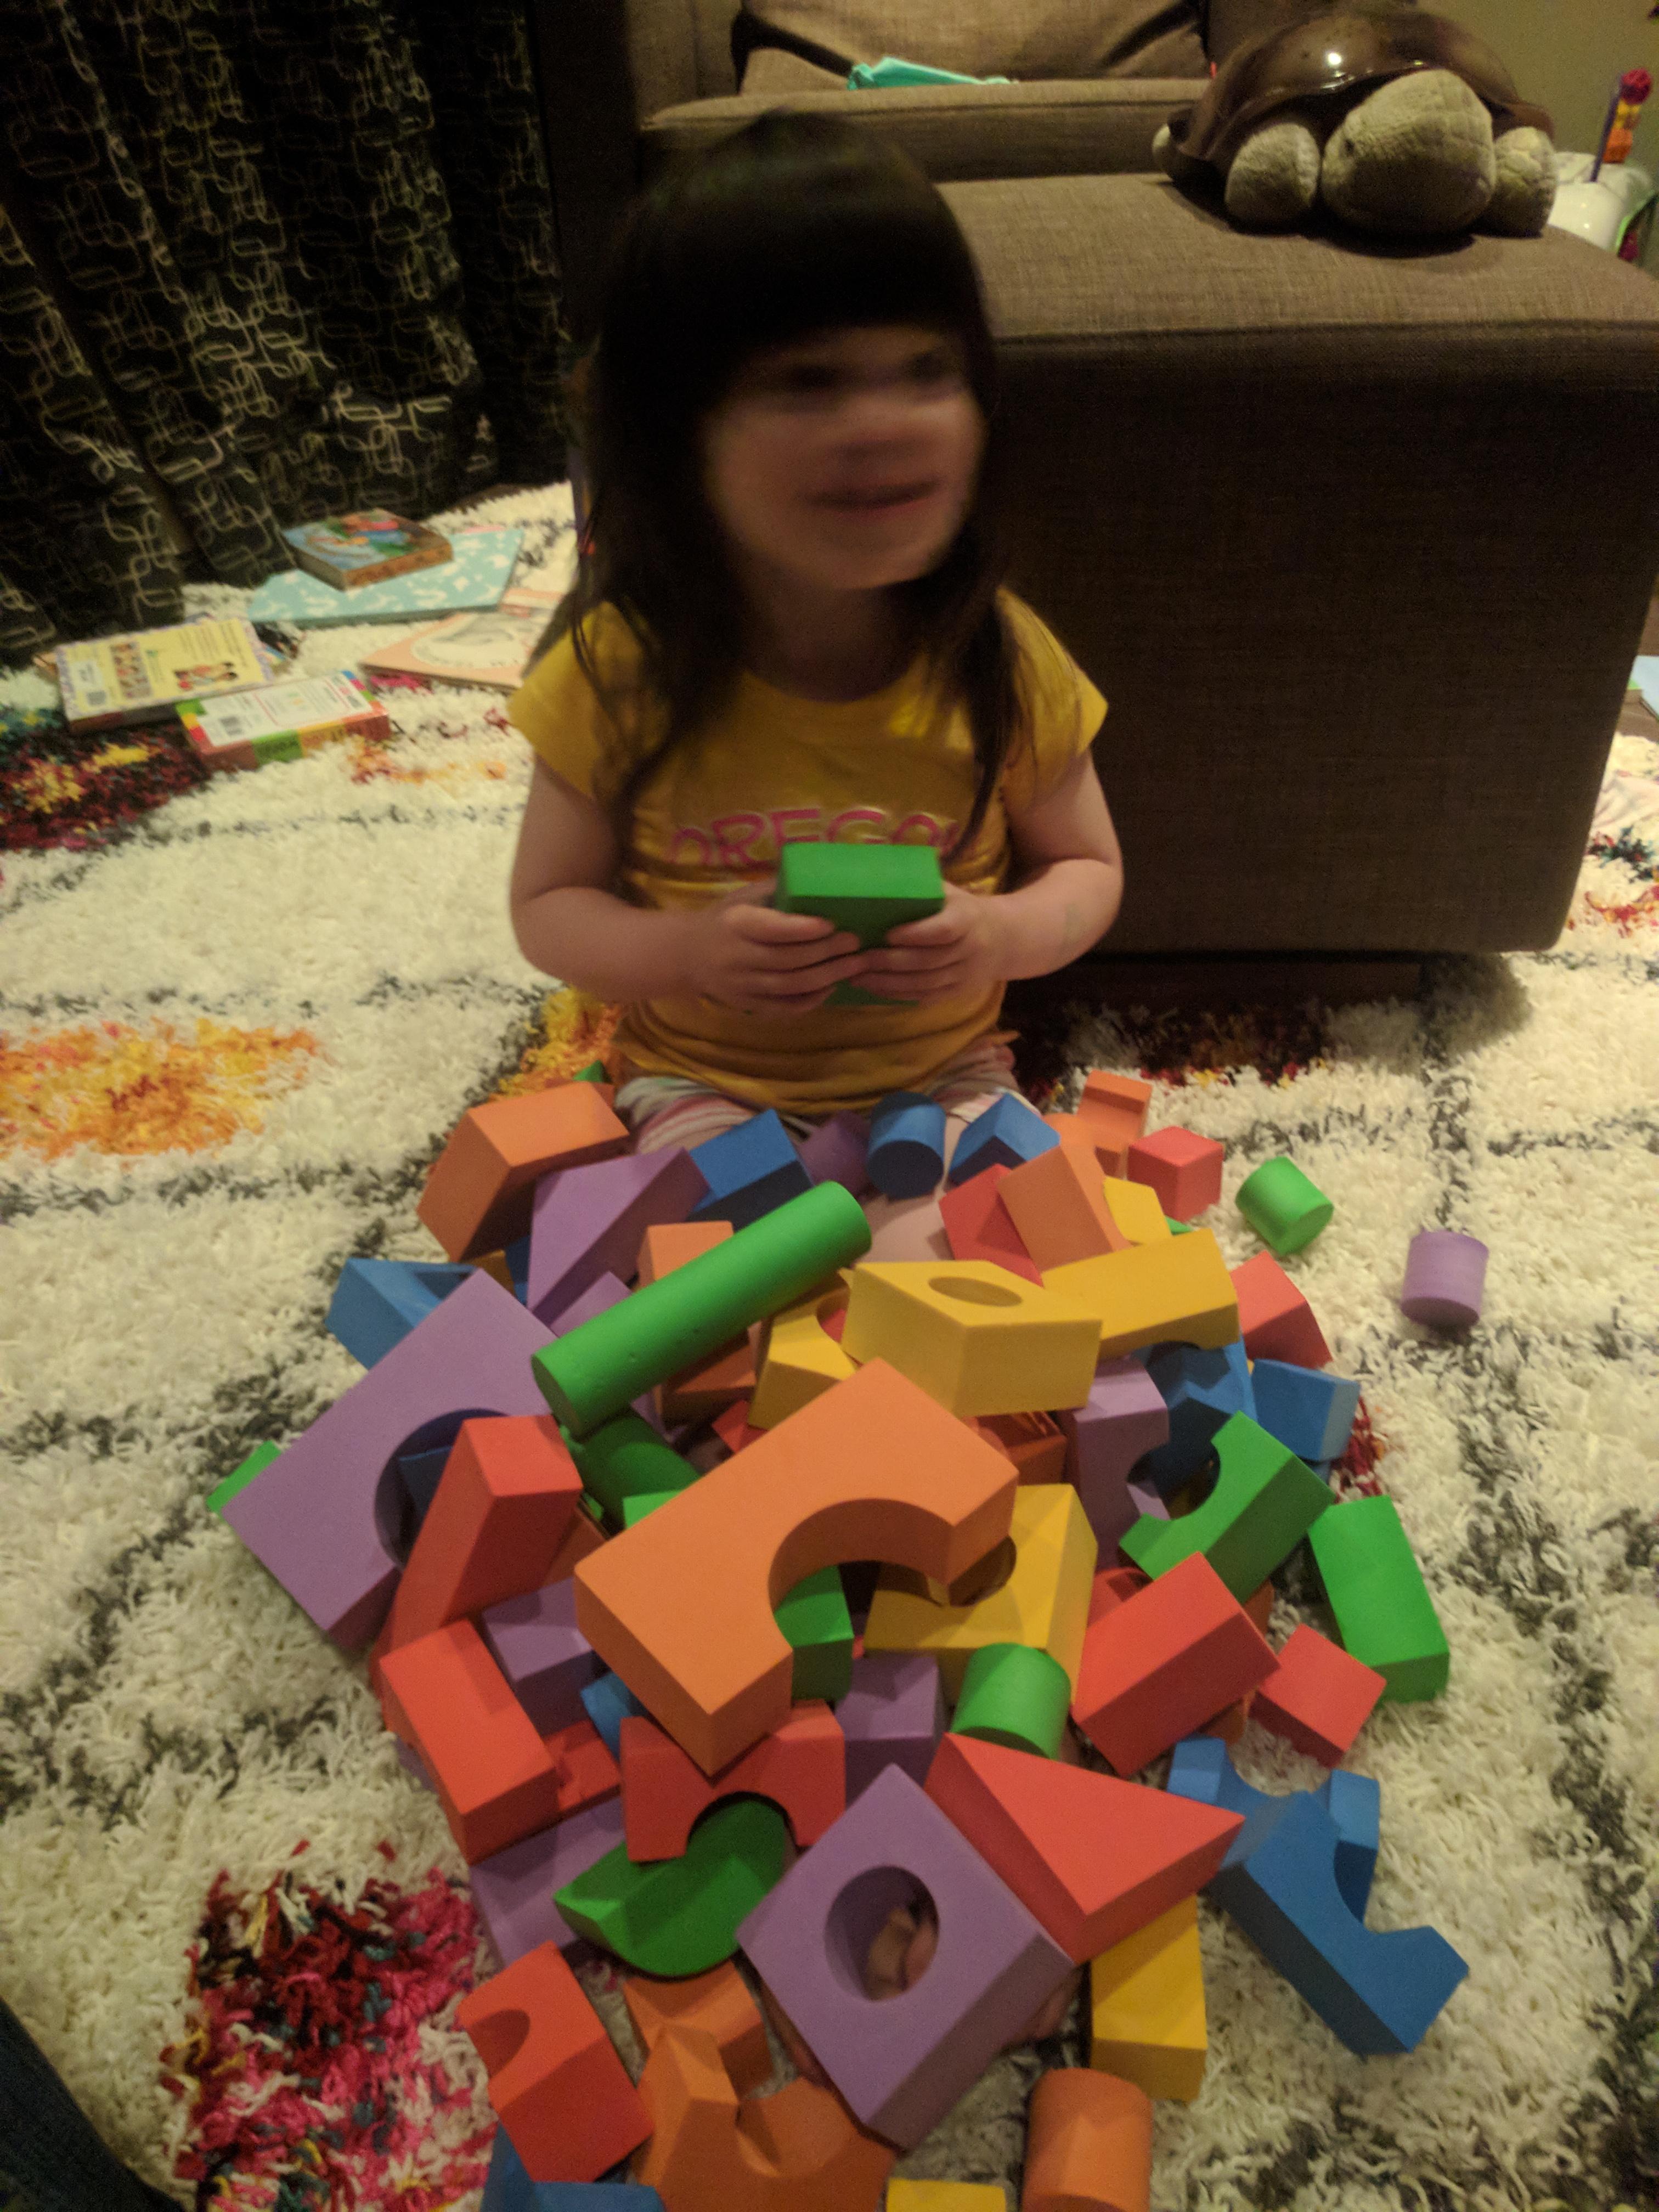 buried_legs_in_blocks_blurry